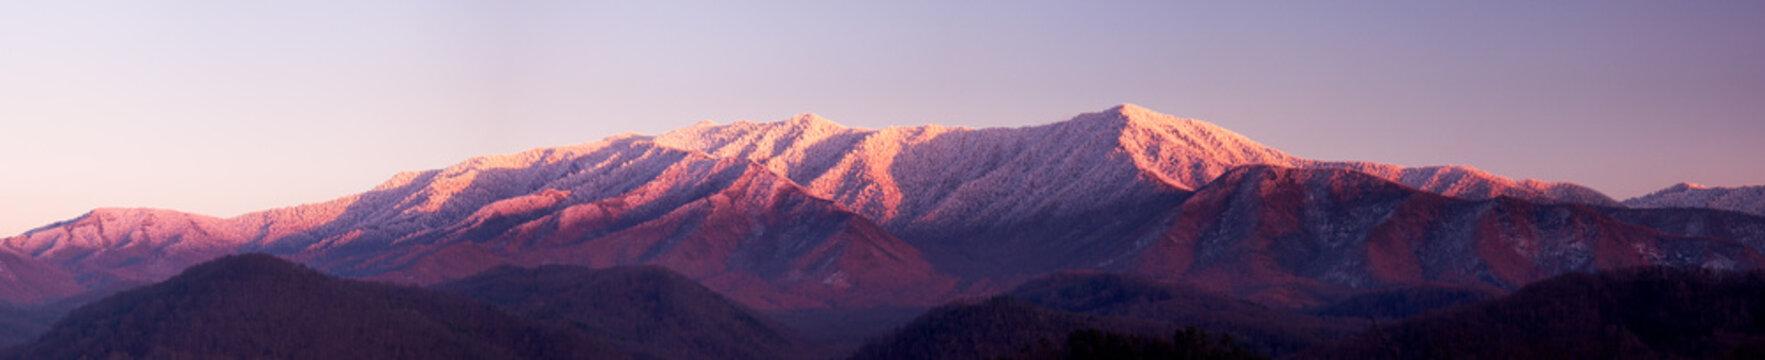 Sun setting on Smoky Mountains